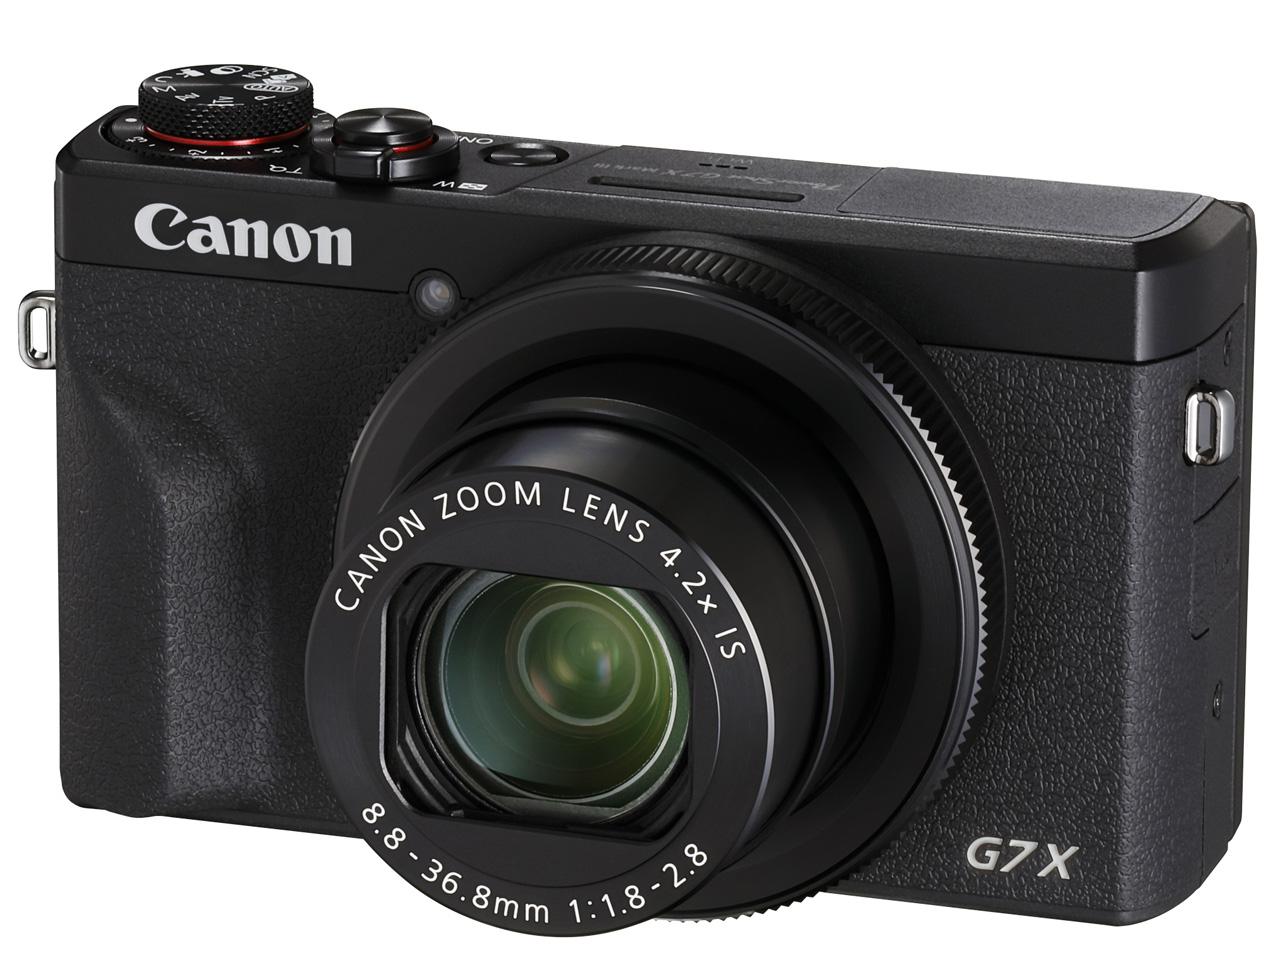 Canon PowerShot G7 X Mark III [ブラック]【お取り寄せ商品(3週間~4週間程度での入荷、発送)】